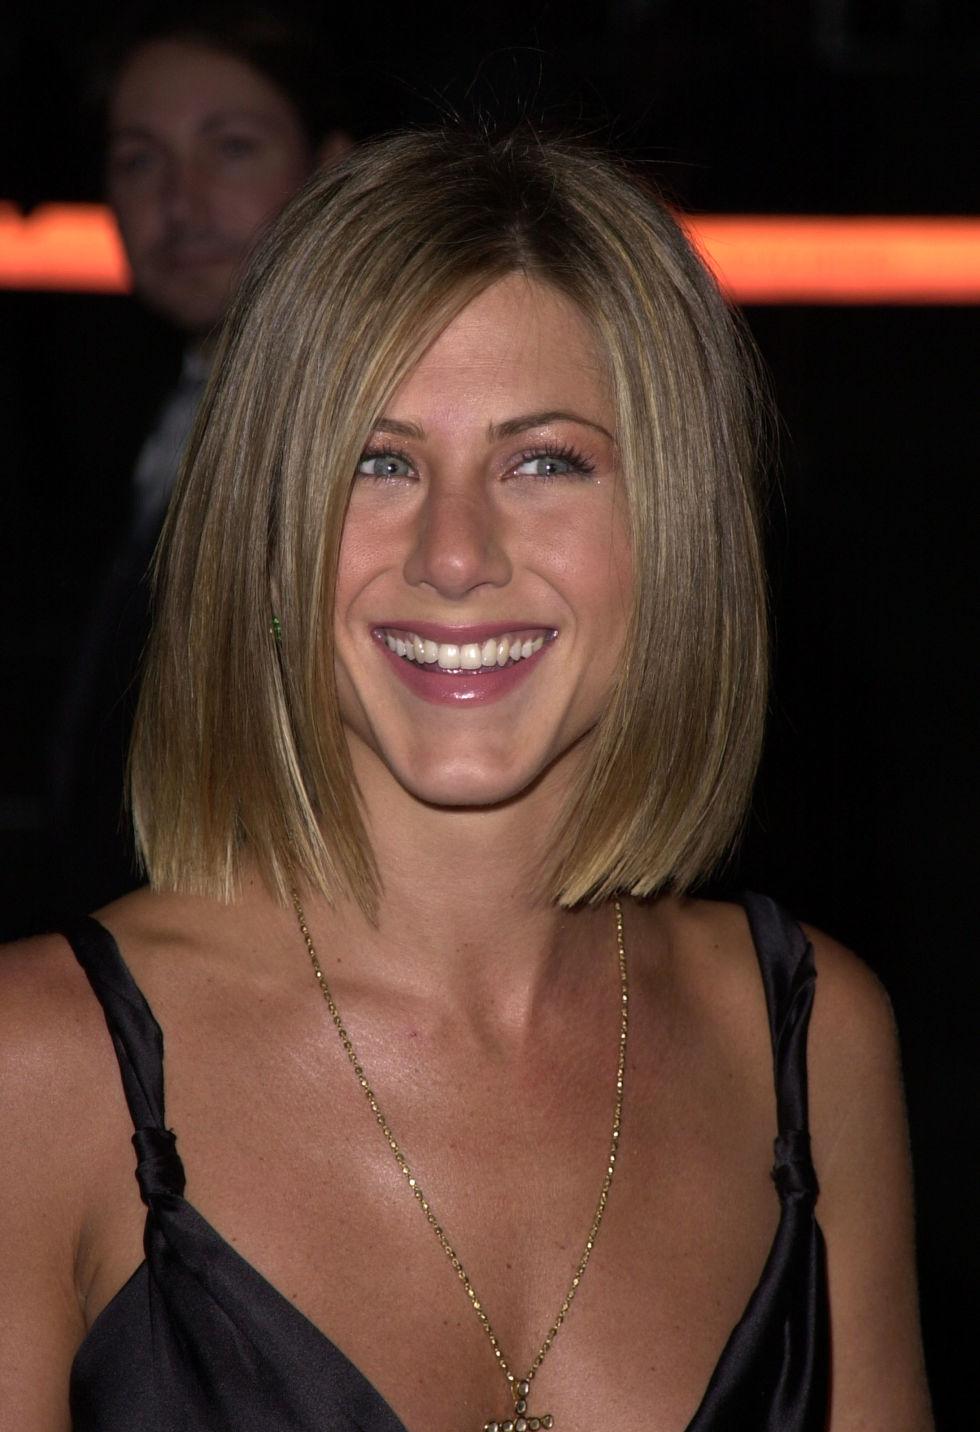 Jennifer Aniston Bob Hairstyle Fade Haircut